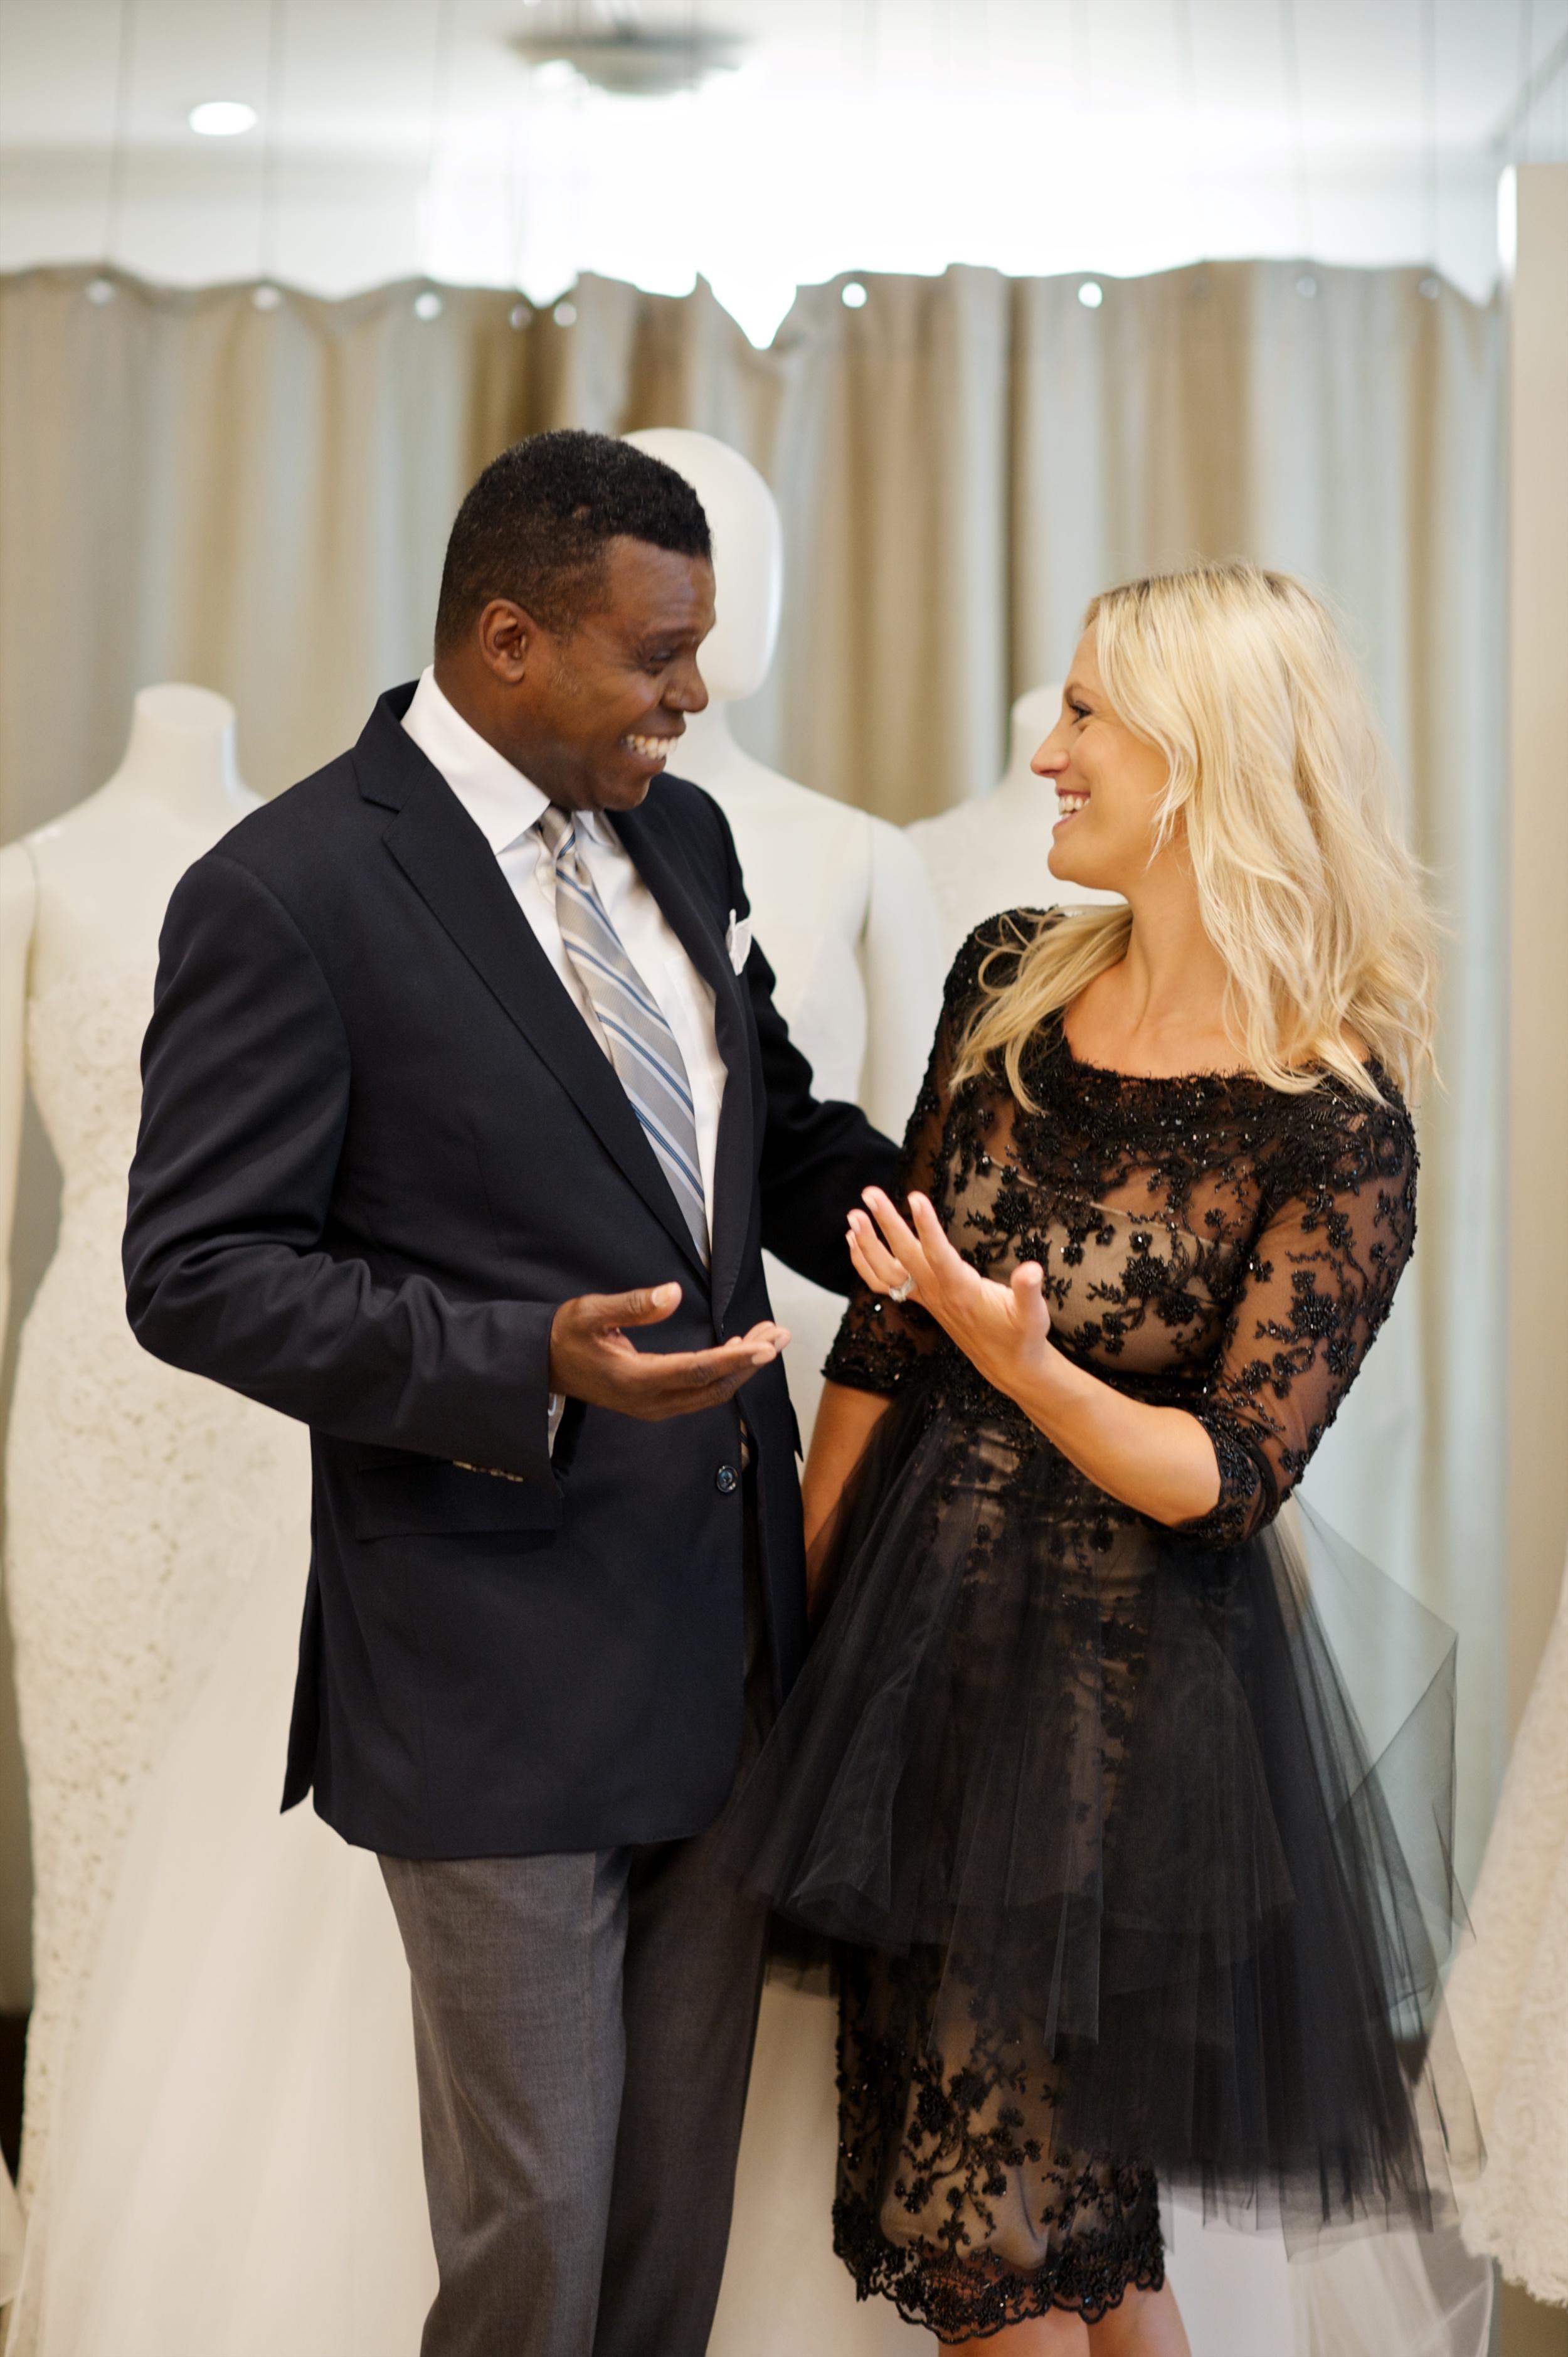 Ceci_New_York_Ceci_Style_Ceci_Johnson_Luxury_Lifestyle_Floral_Lace_Wedding_Letterpress_Inspiration_Design_Custom_Couture_Personalized_Invitations_4.jpg